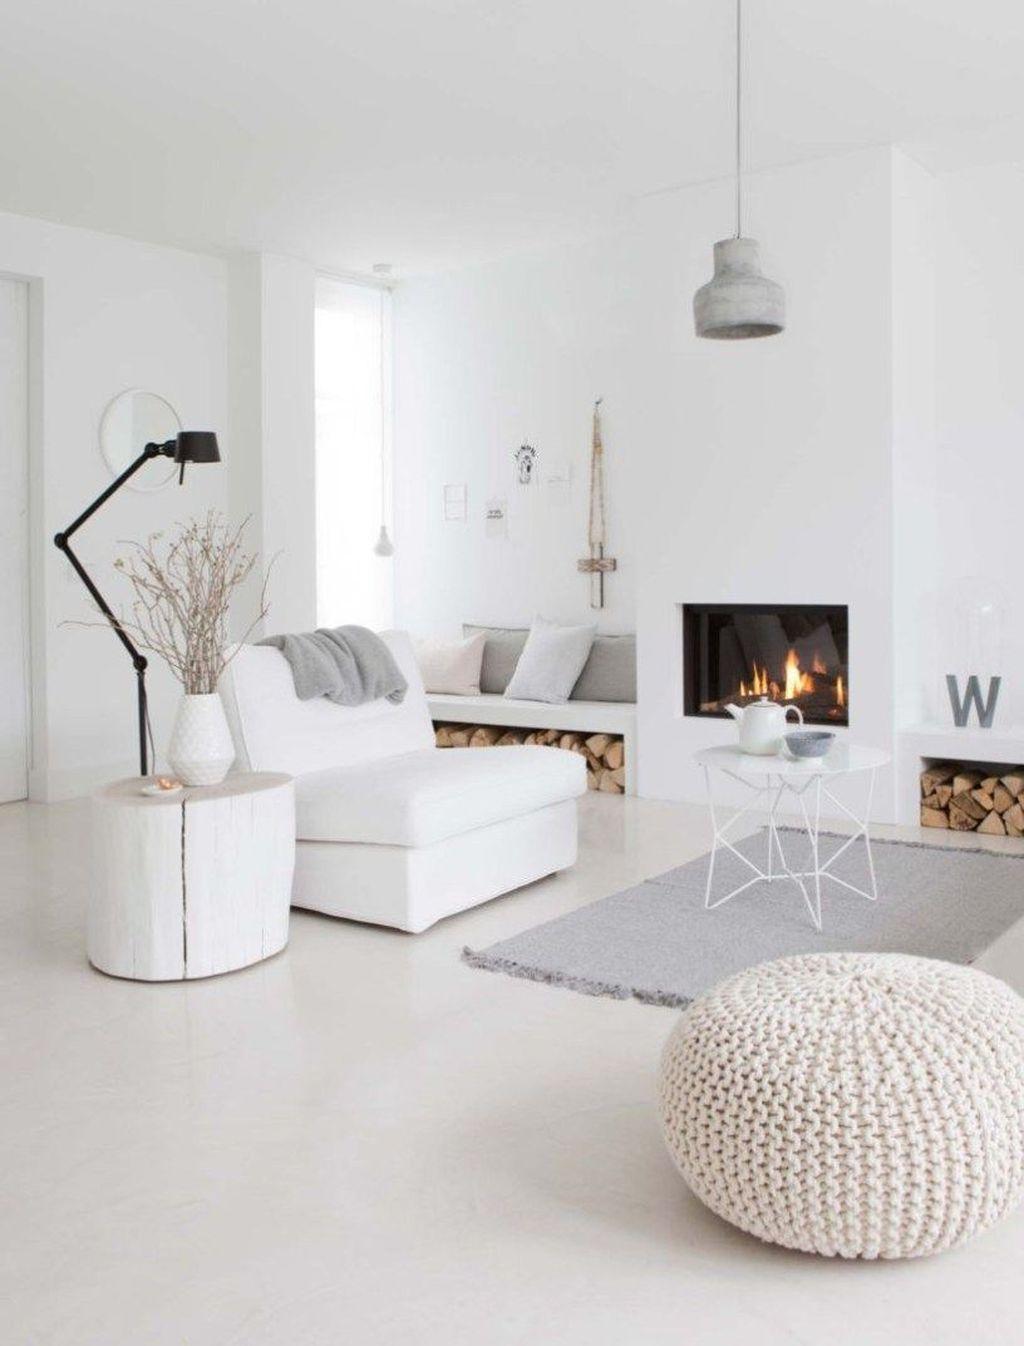 awesome 55 inspiring modern minimalist home decor ideas on a budget